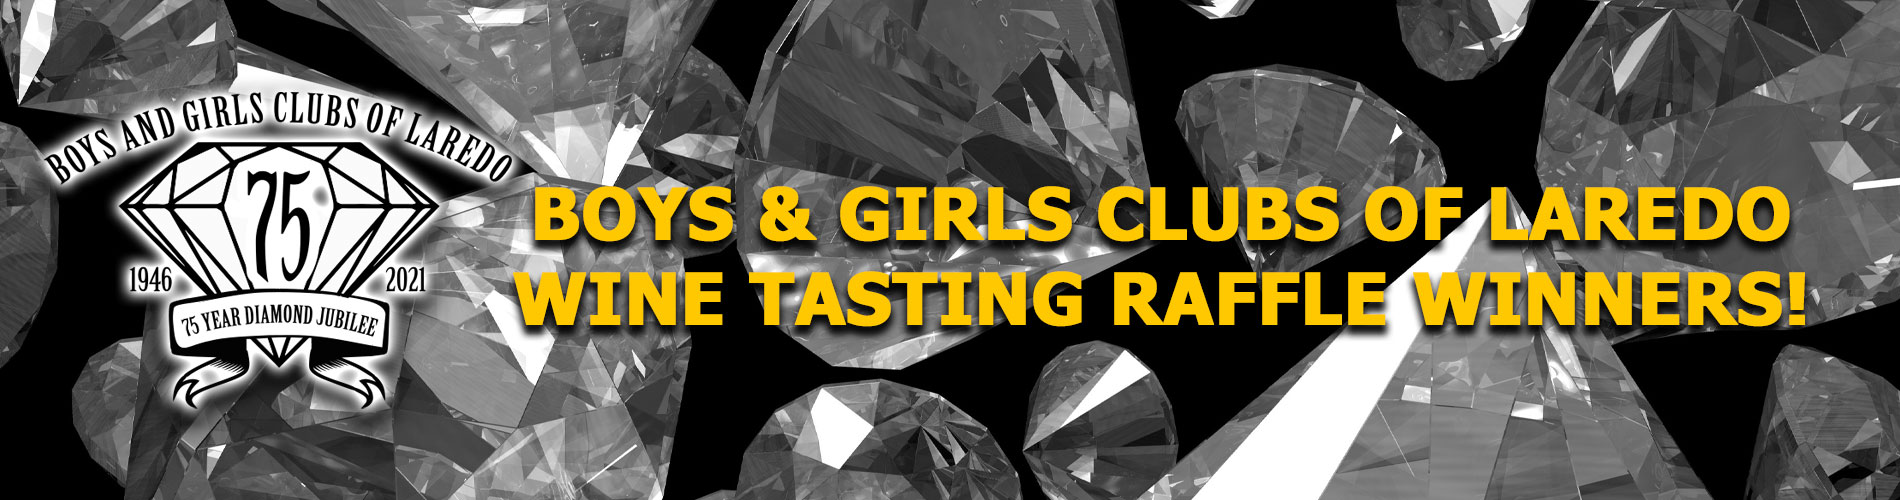 Boys & Girls Clubs of Laredo Wine Tasting Raffle Winners